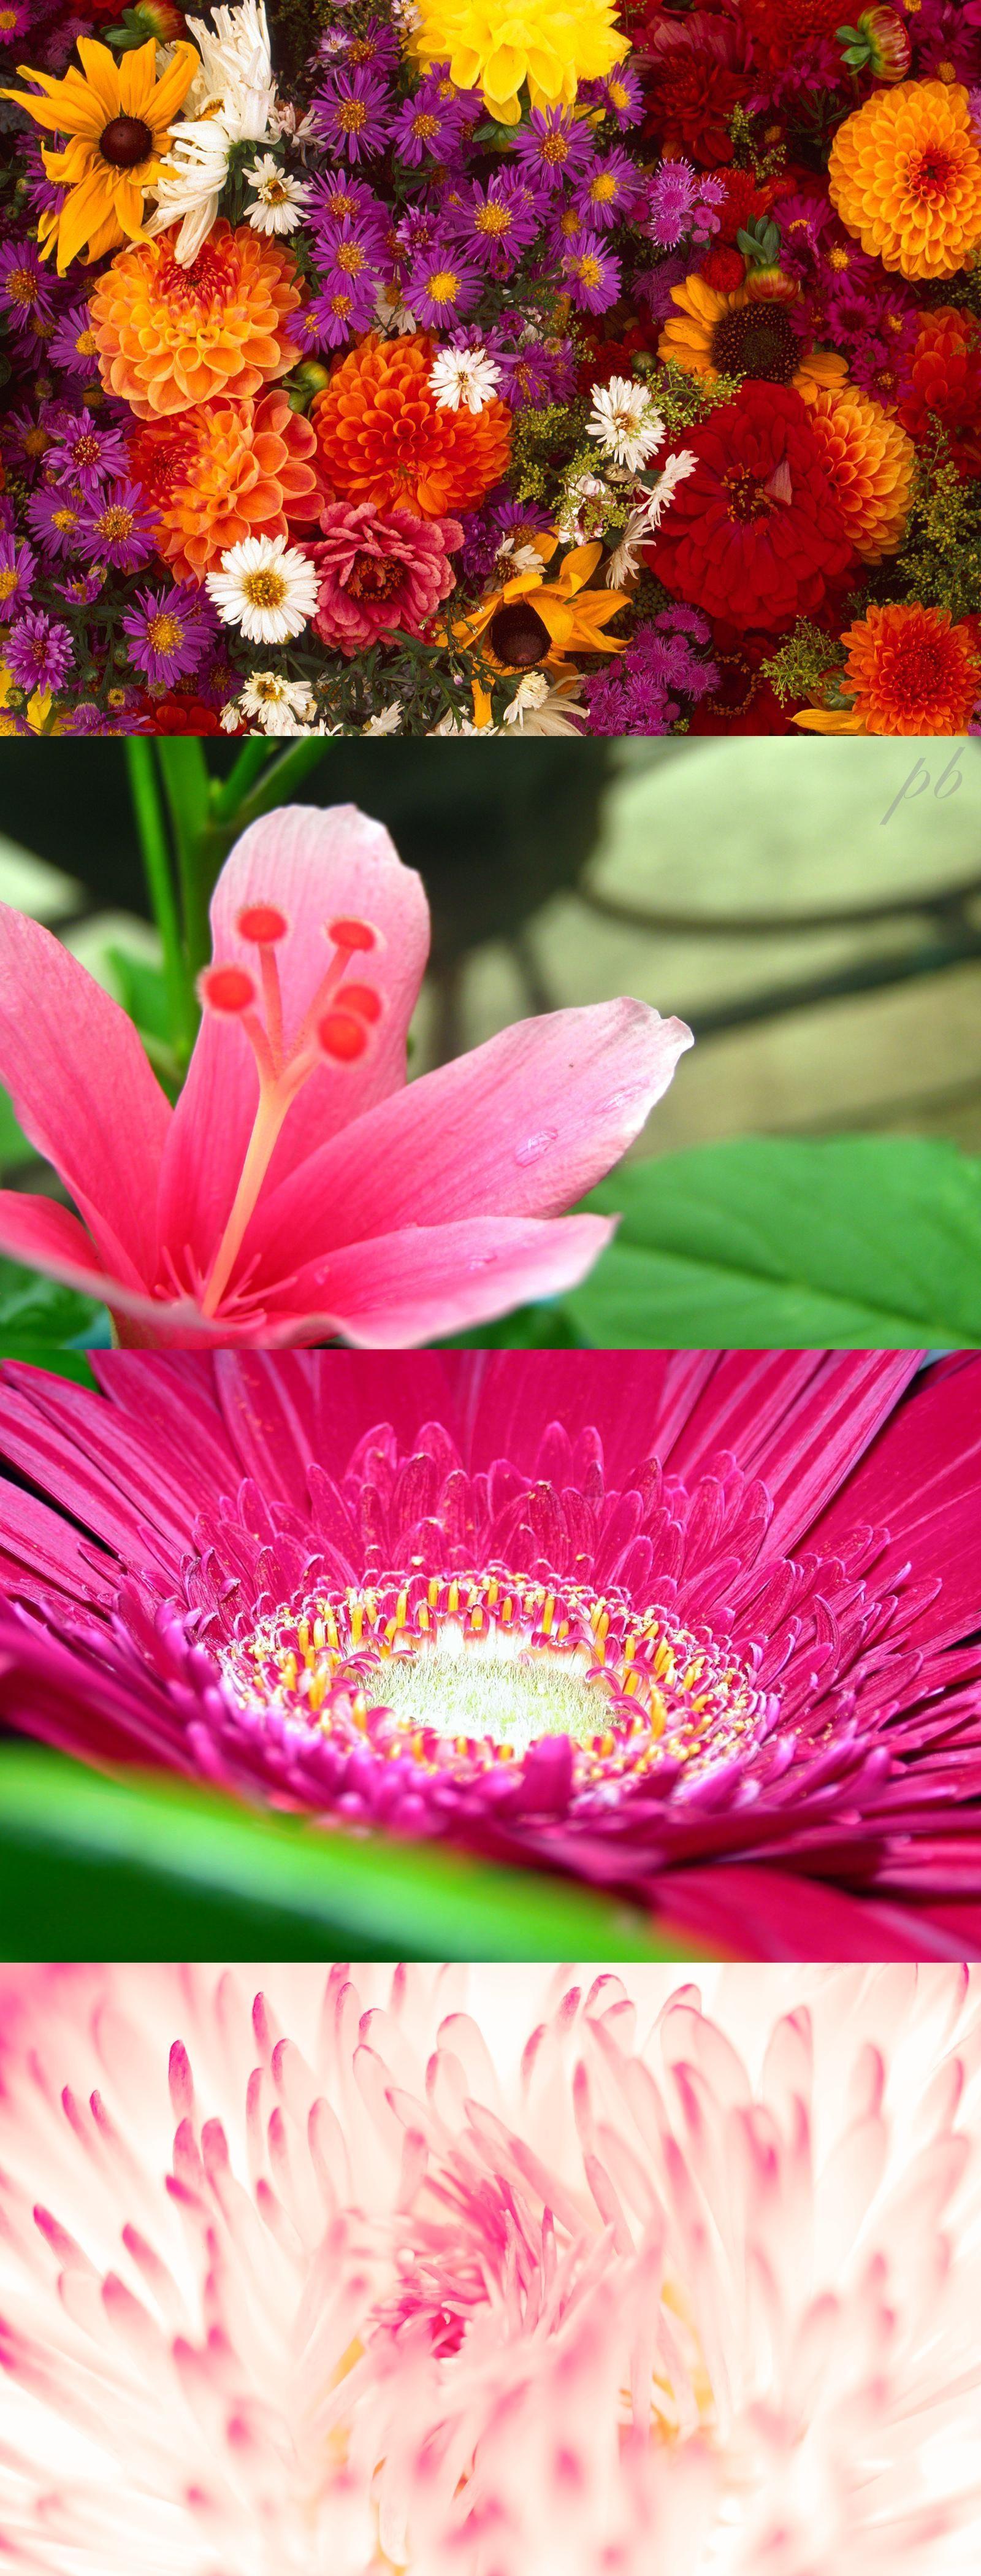 Spring Daisy Flower